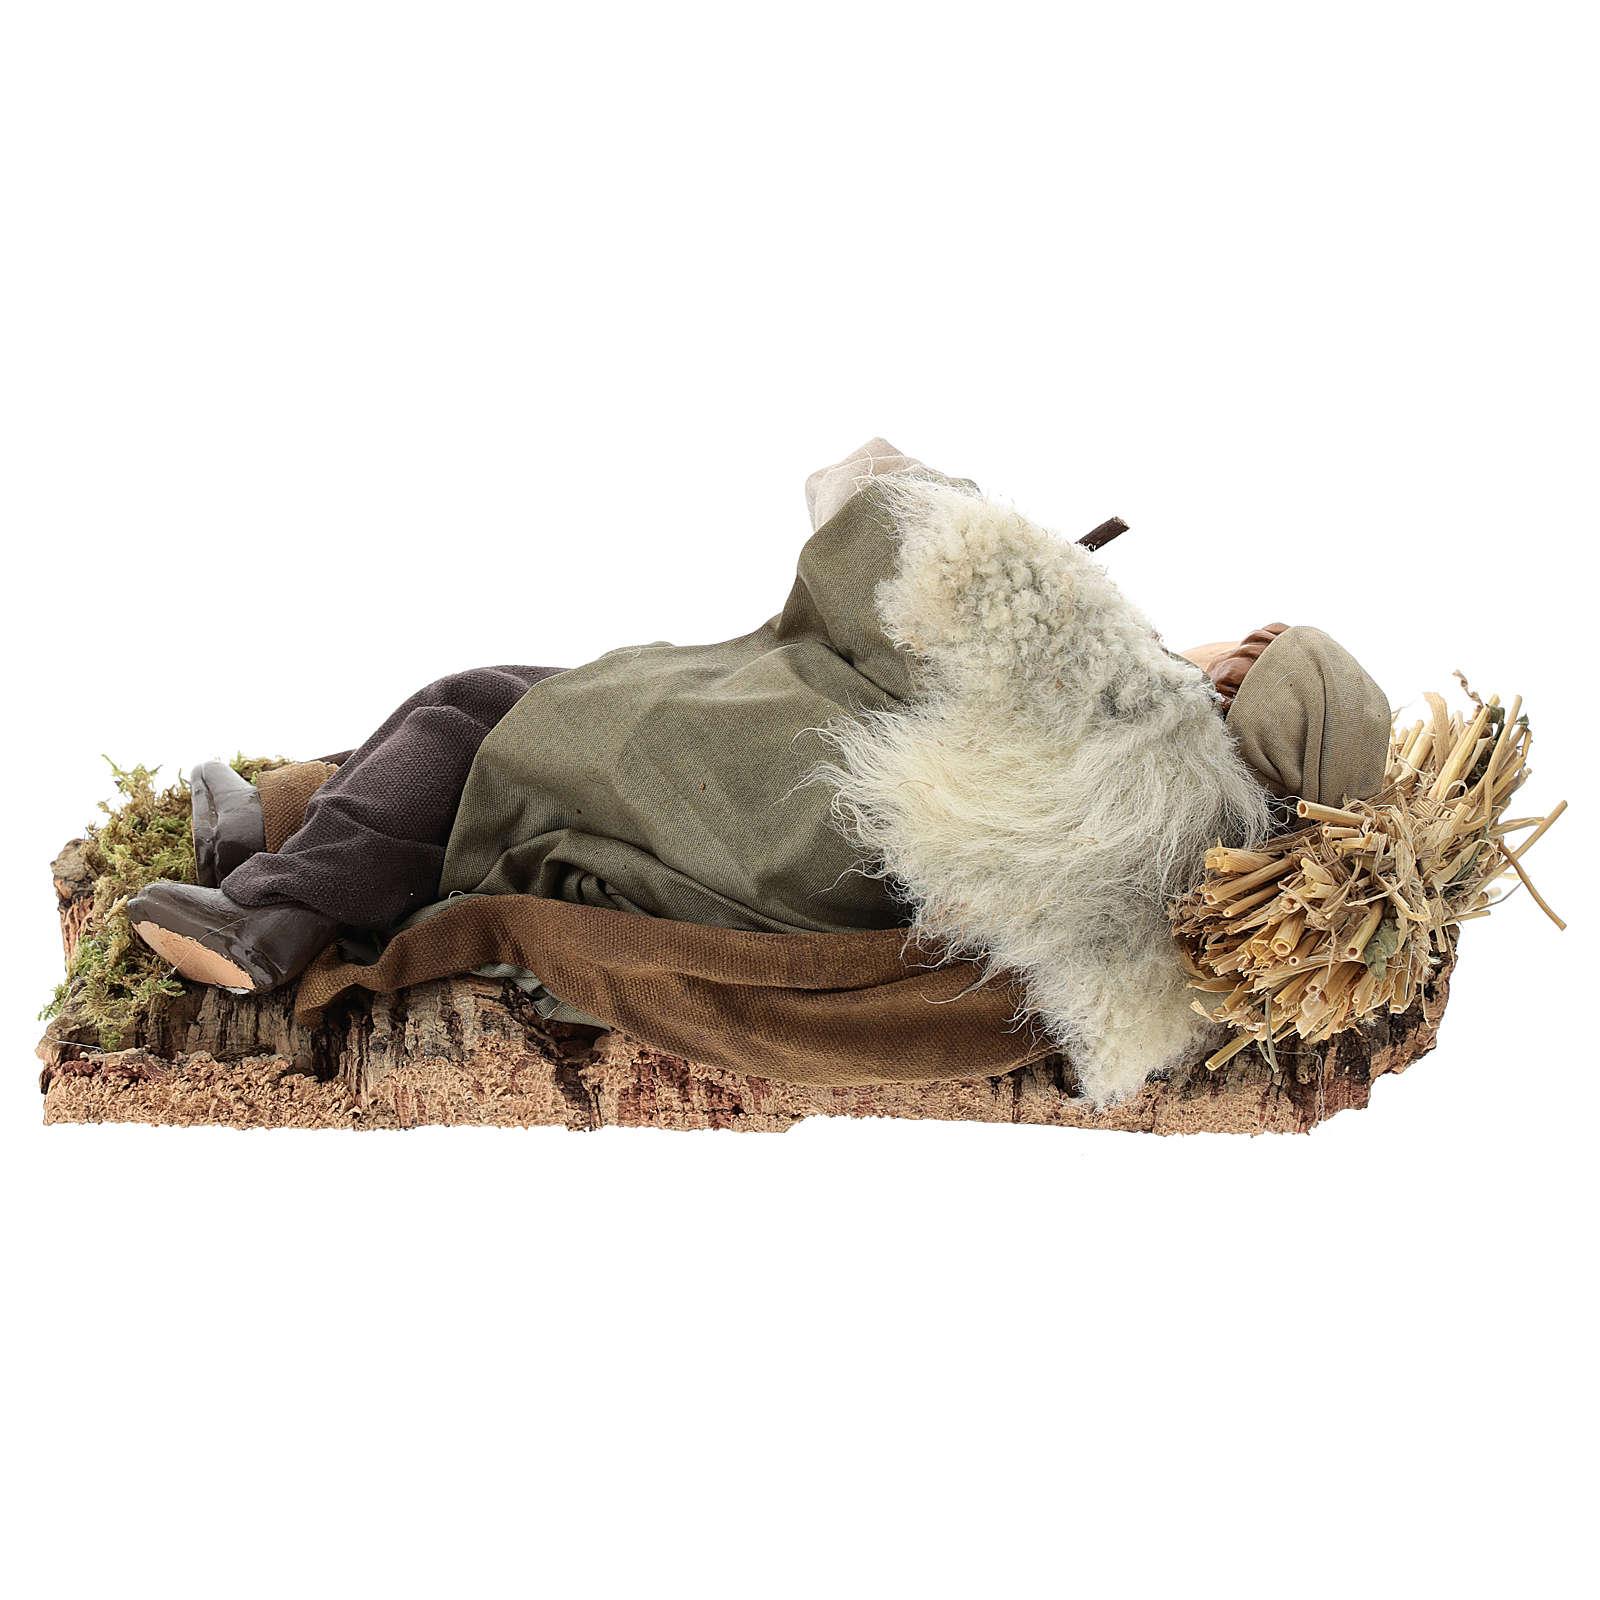 Hombre que duerme para belén de Nápoles 30 cm de altura media 4